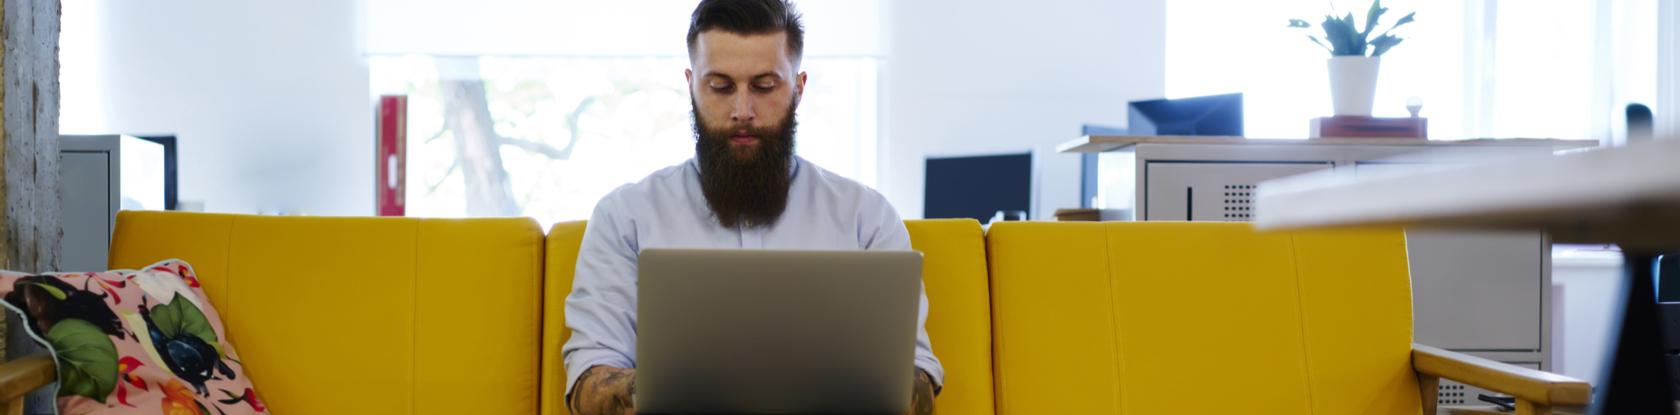 Hybrid Workplace Talent Retention